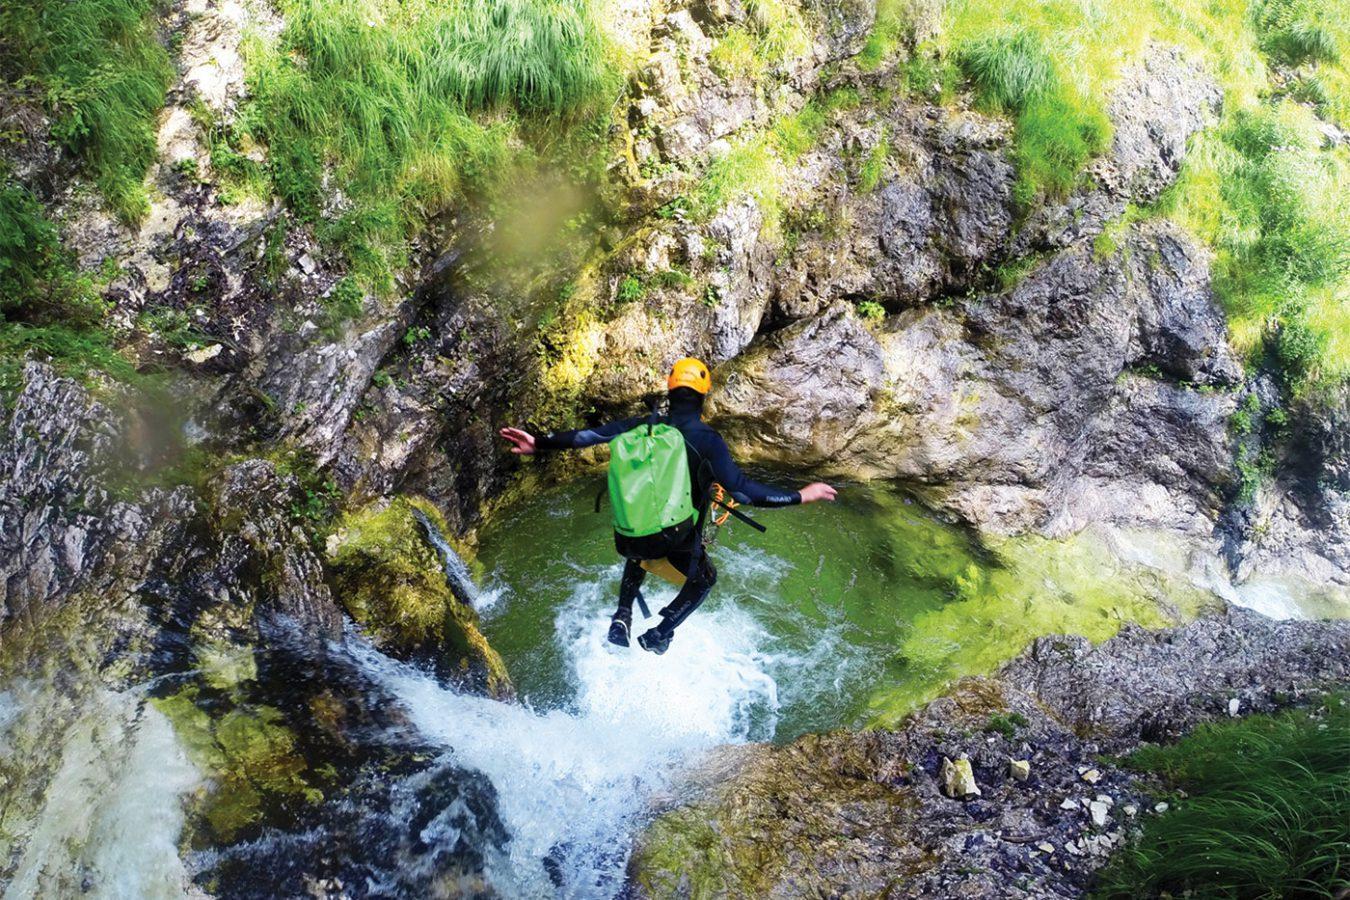 Active Holidays Canyoning Bovec Asa Residence Private Villa Kras Slovenia